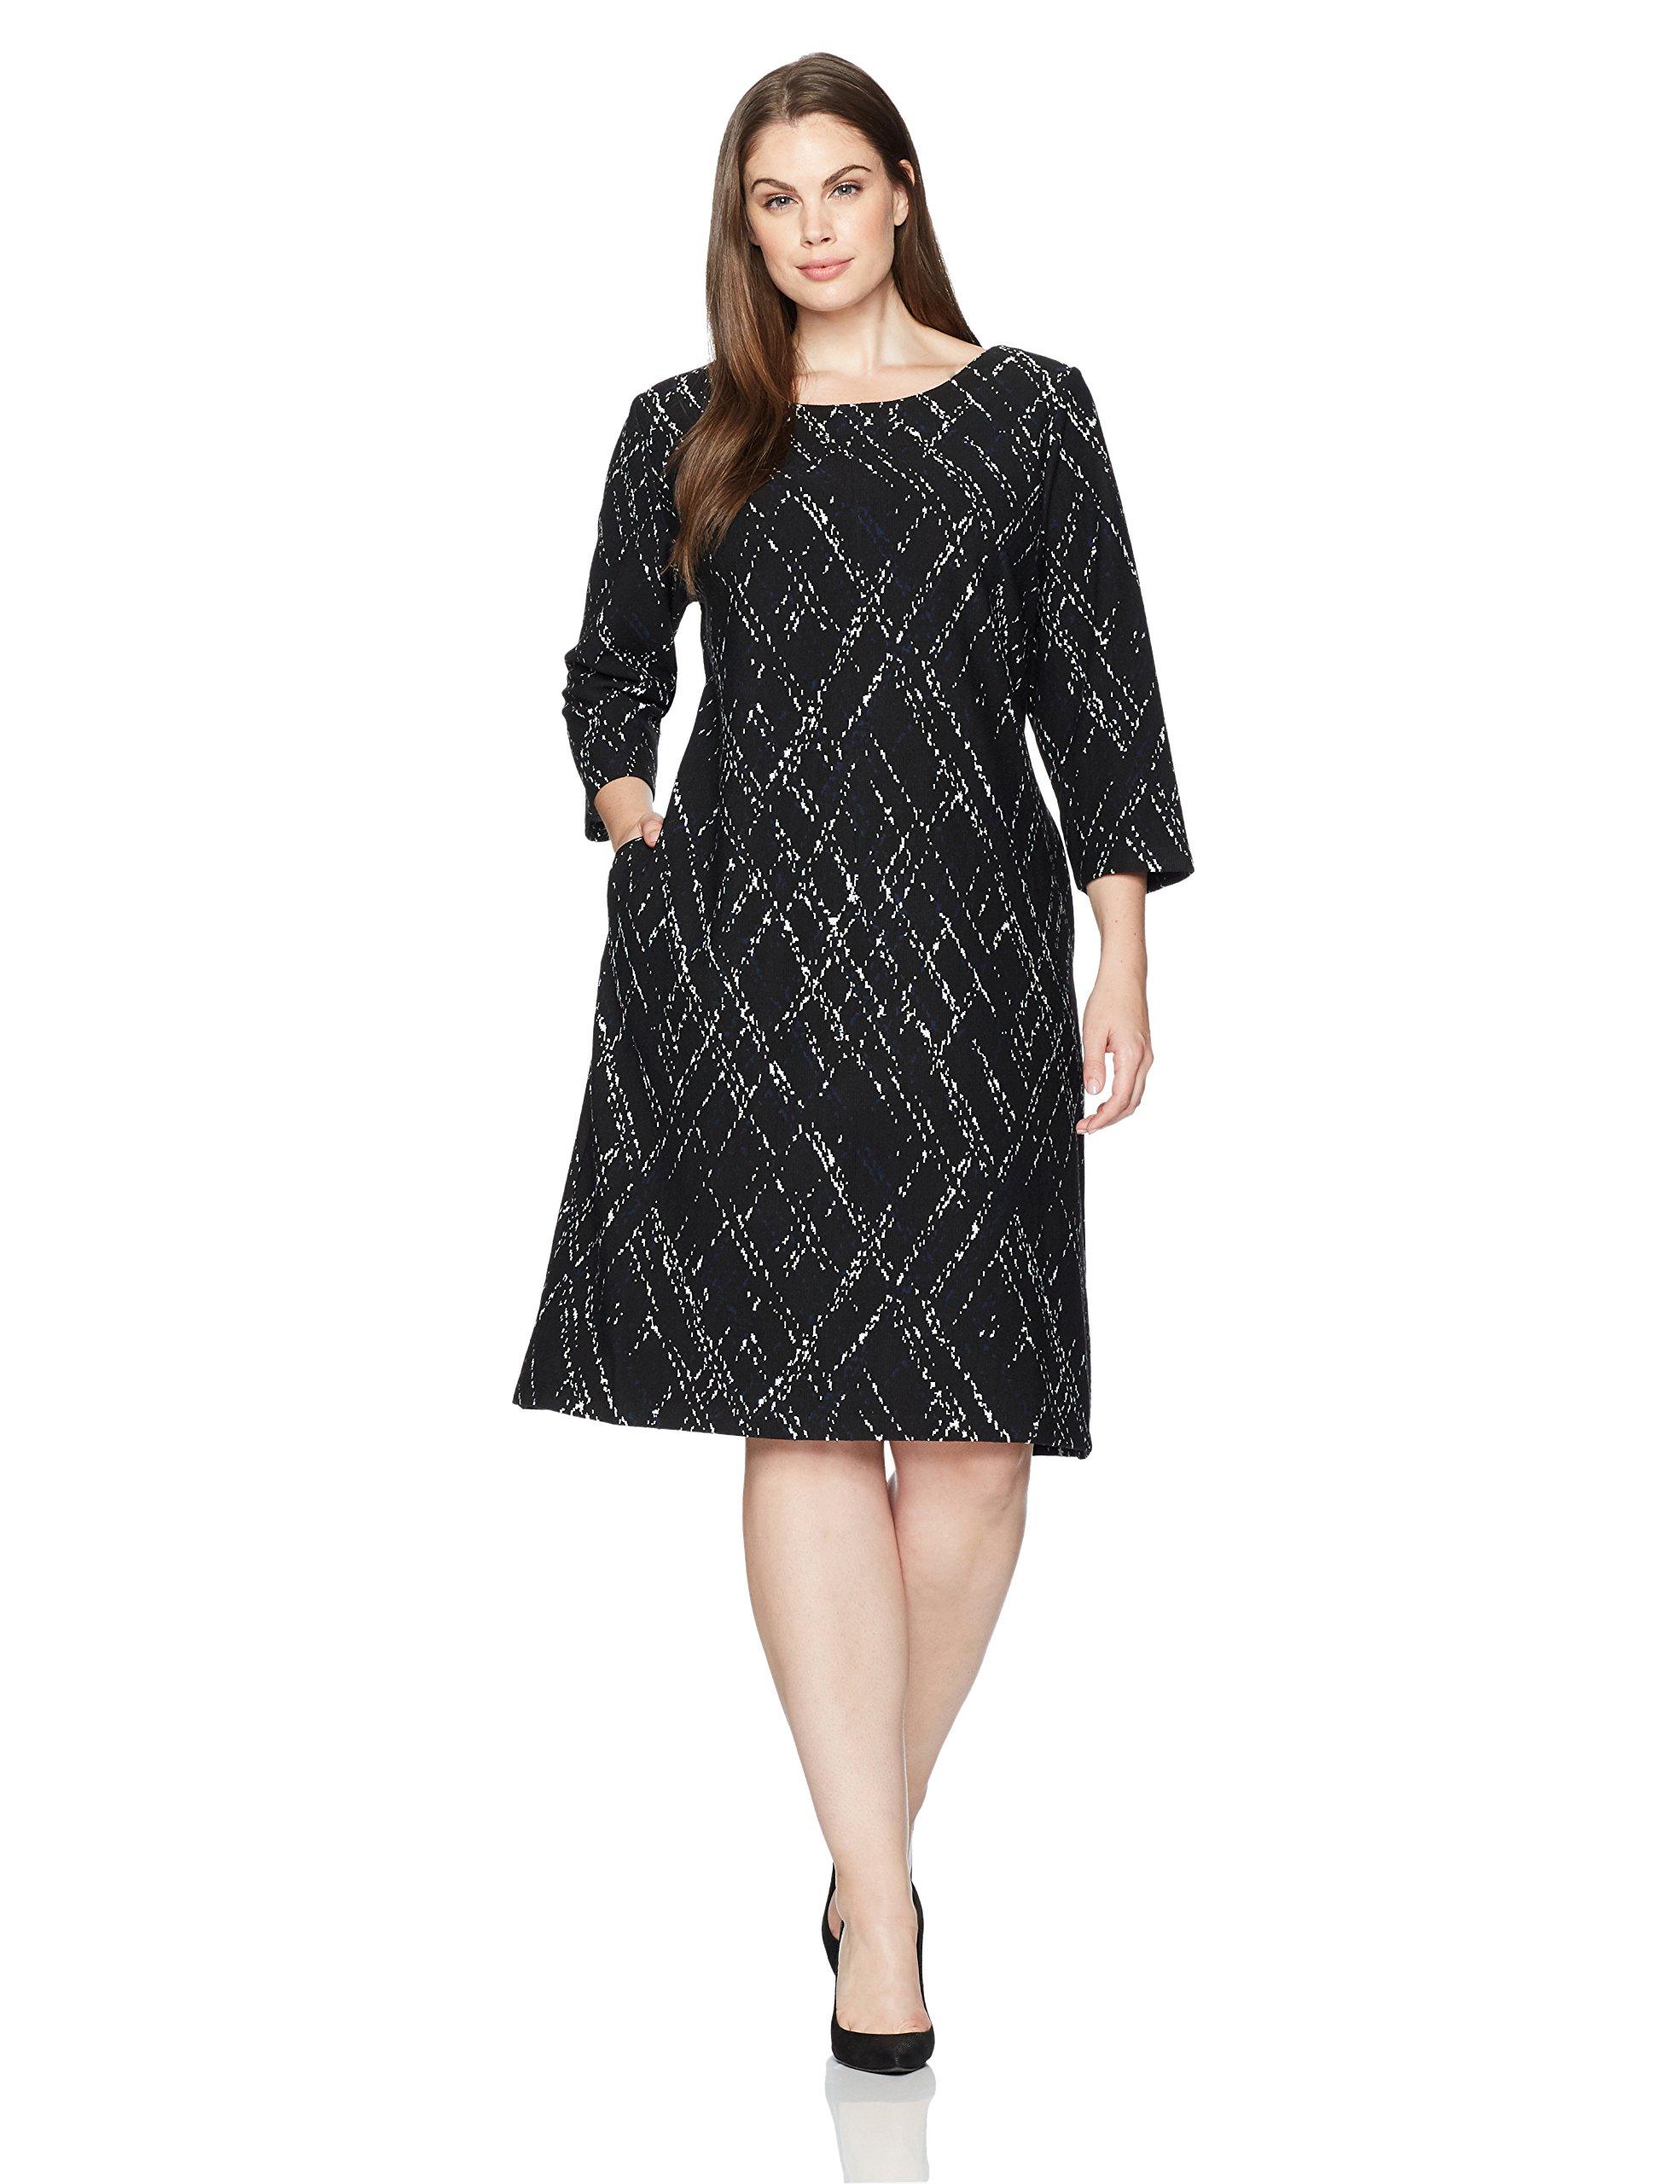 Taylor Dresses Women's Plus Size Matchstick Print Novelty Jacquard Knit Dress, Lapis Ivory/Black, 16W by Taylor Dresses